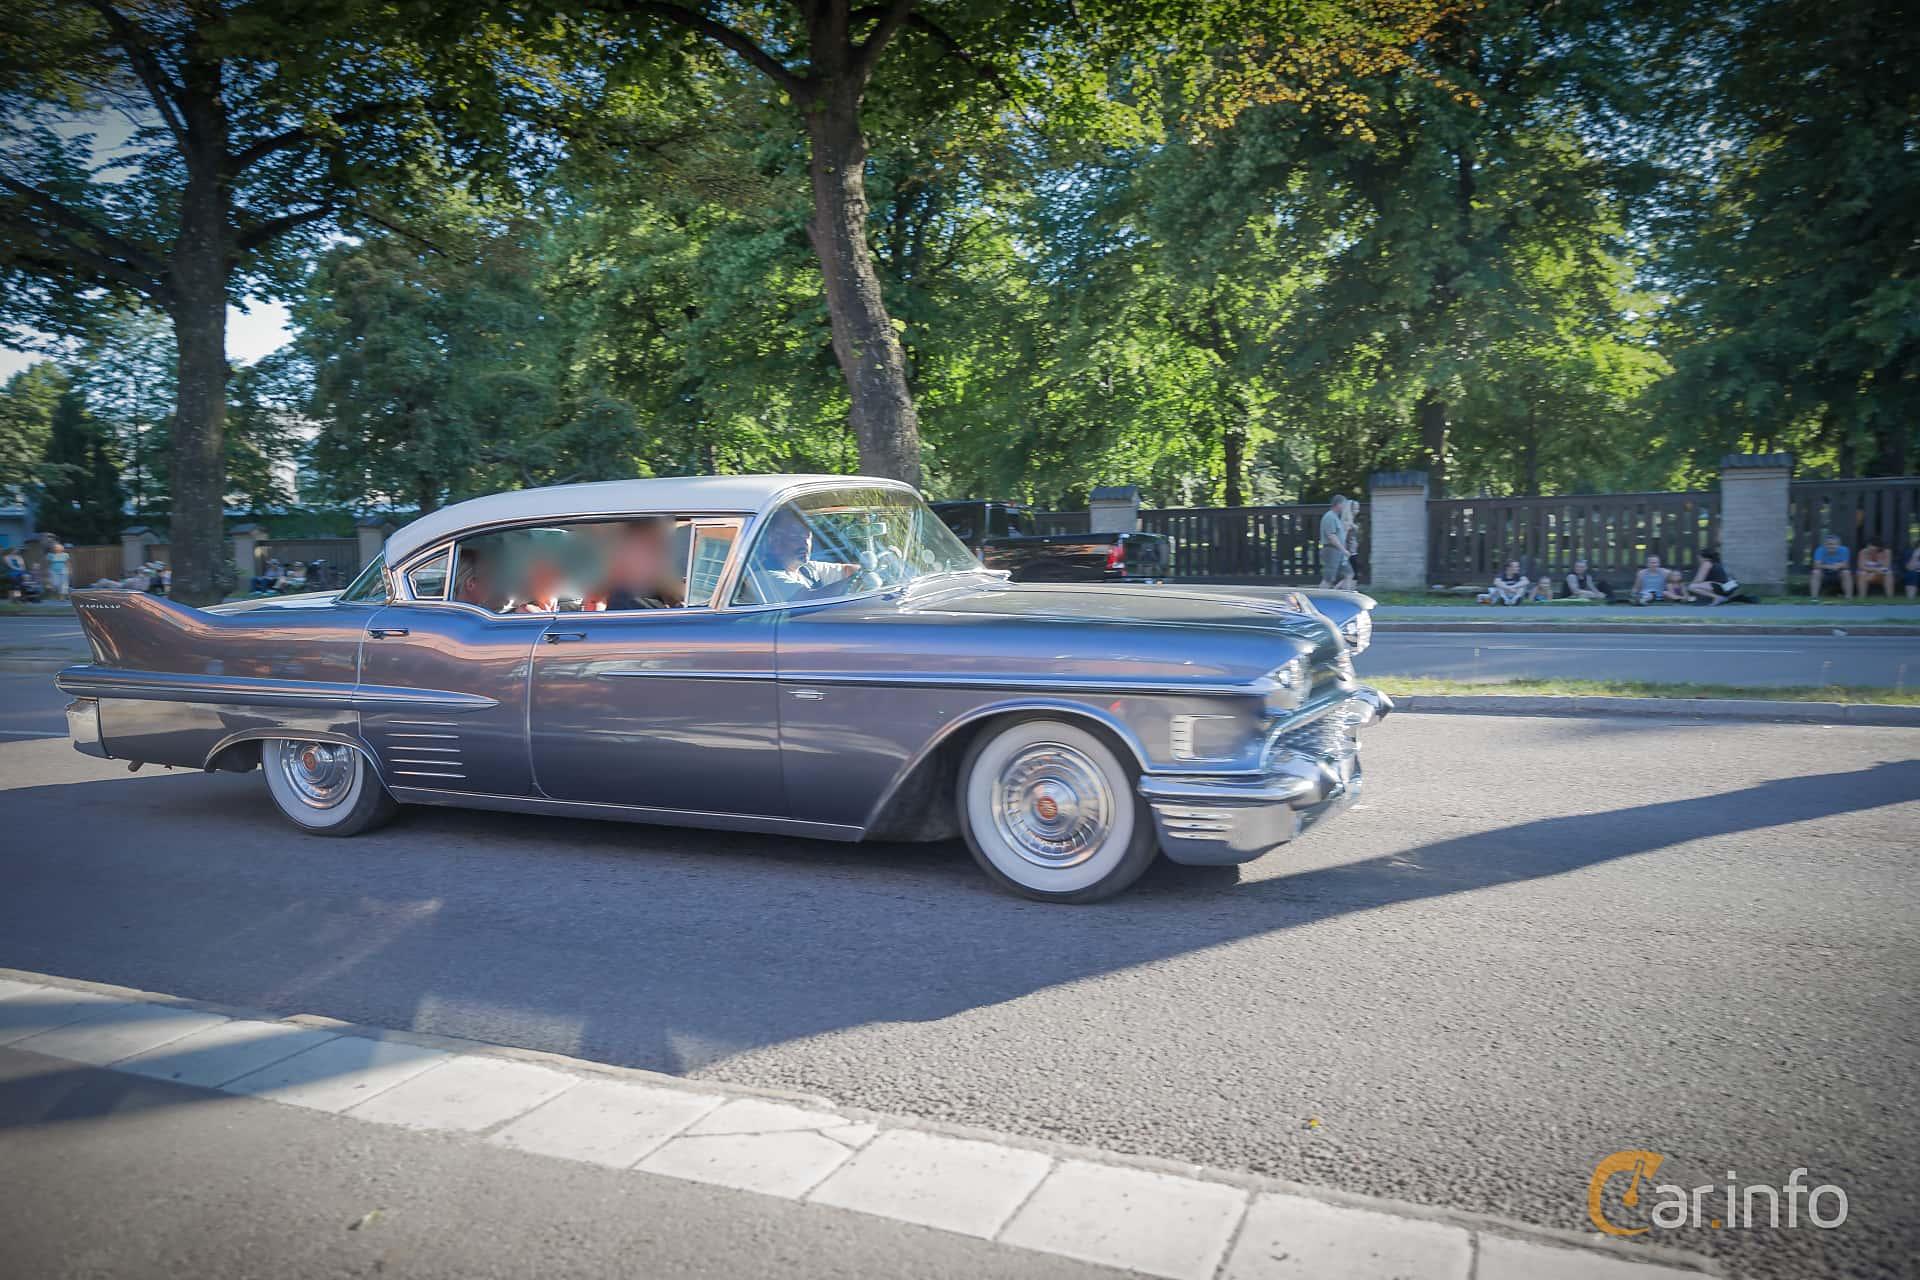 Cadillac Sixty-Two Sedan de Ville 6.0 V8 Automatic, 314hp, 1958 at Power Big Meet 2015